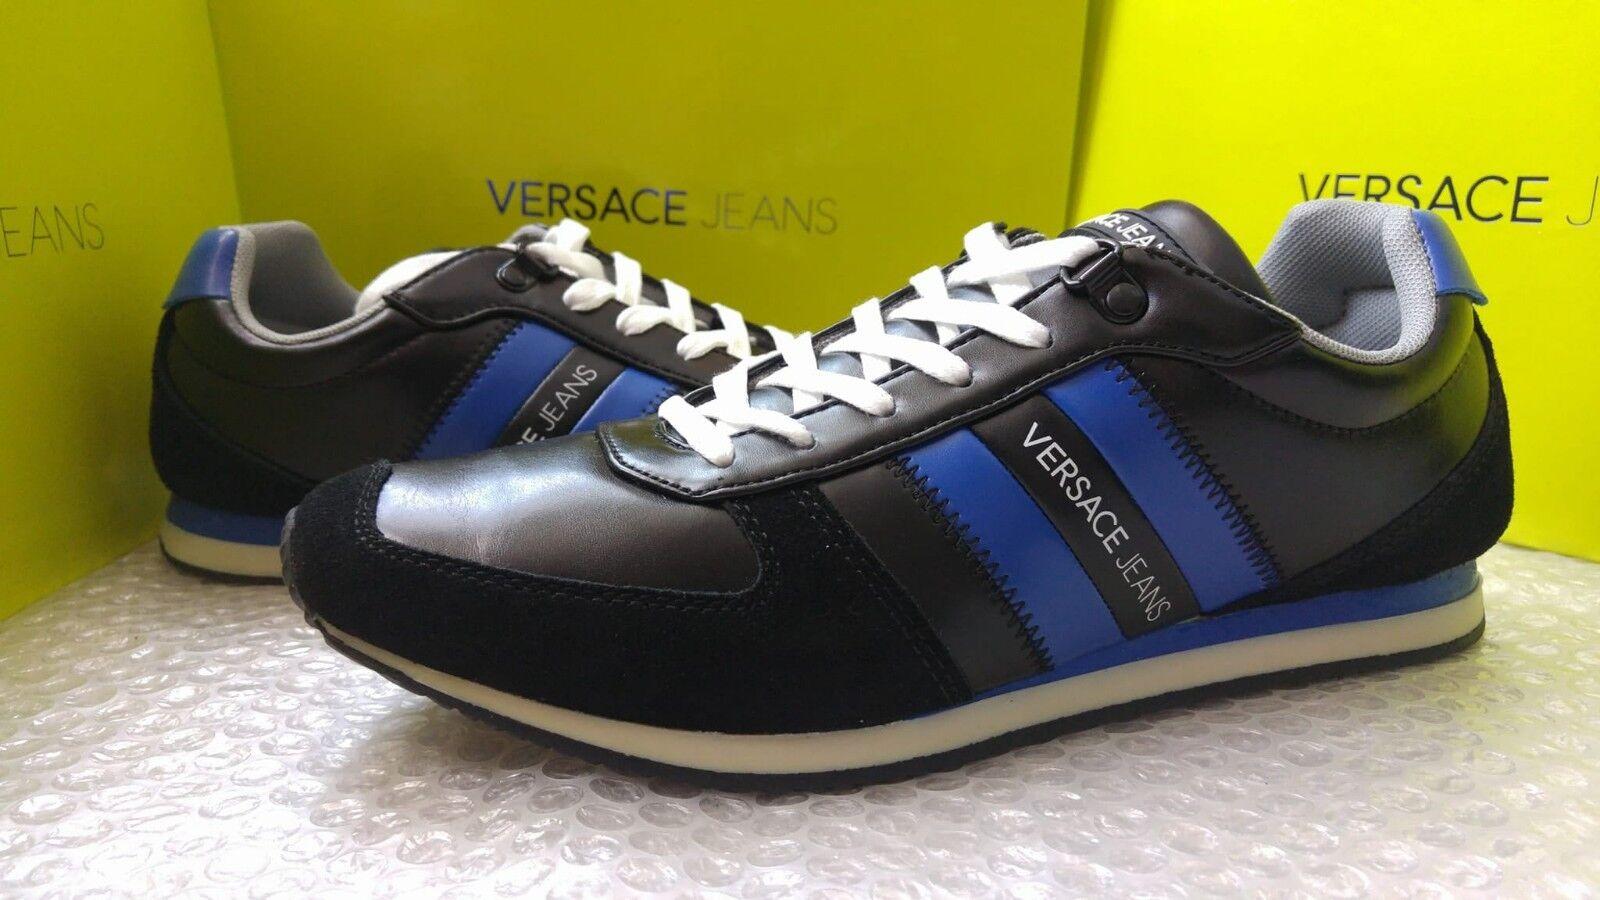 Versace Jeans men's black & bluee sneakers size 40EU (6.5UK)